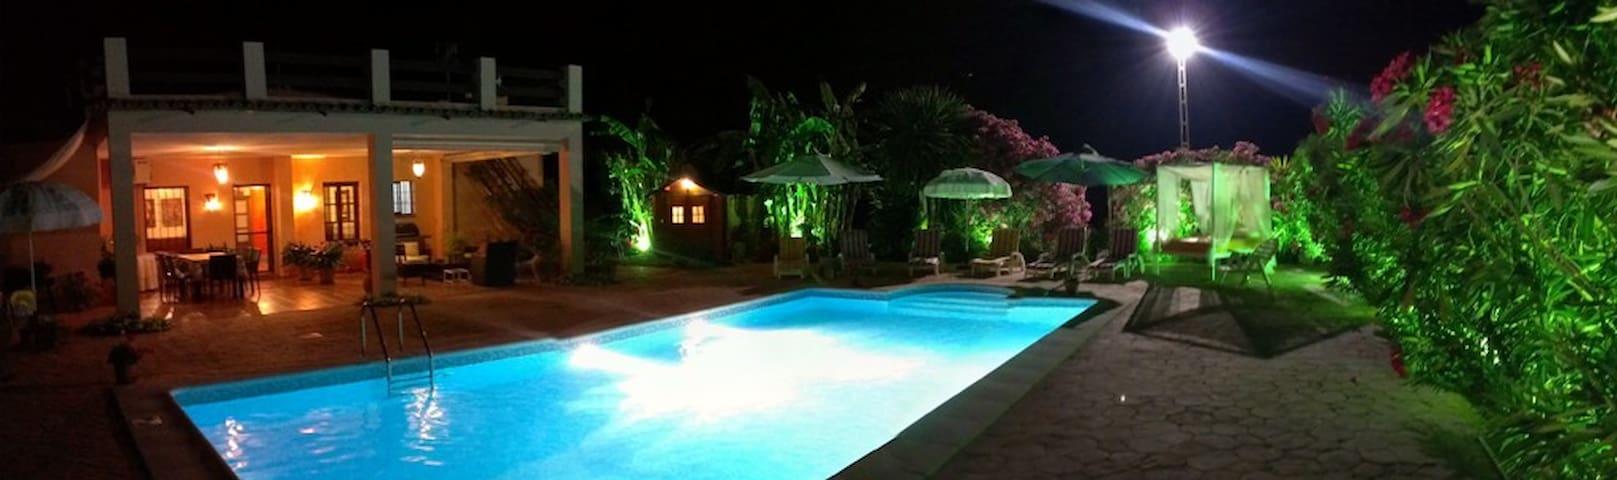 La Casa Azahar · com - San Martín del Tesorillo - Villa